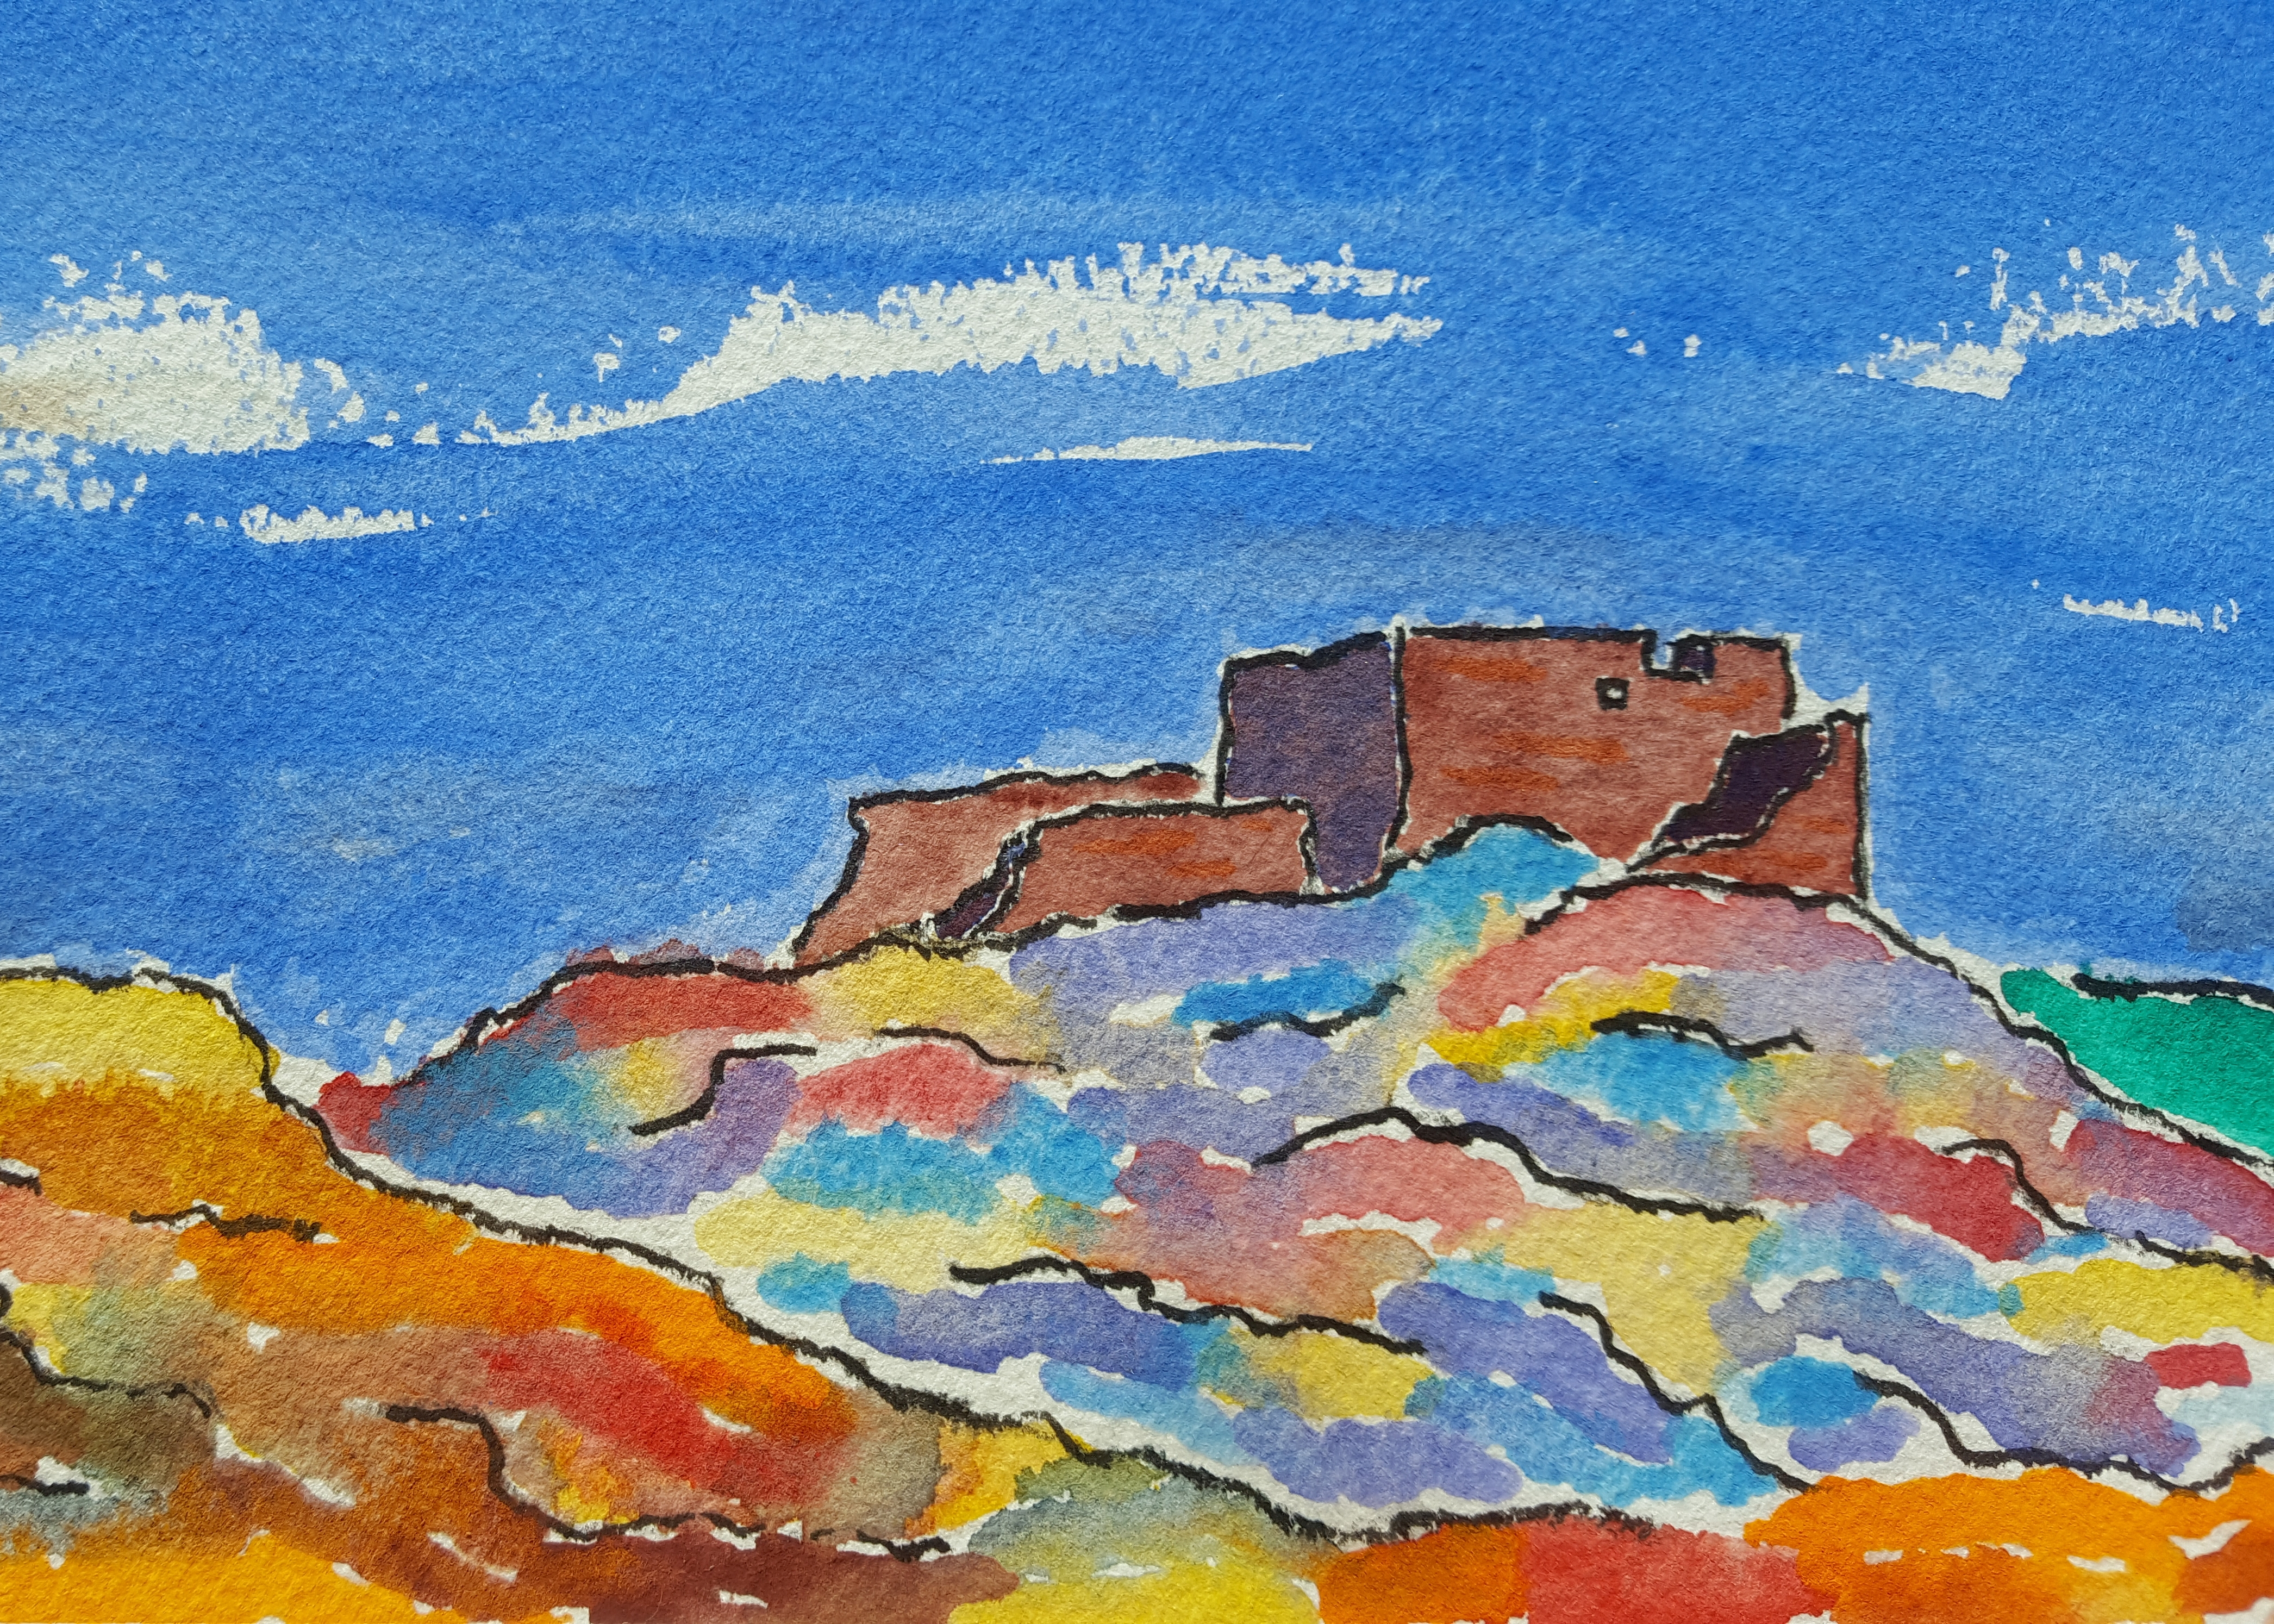 Wupatki Pueblo Lore #1 ~ Watercolor by John Klobucher